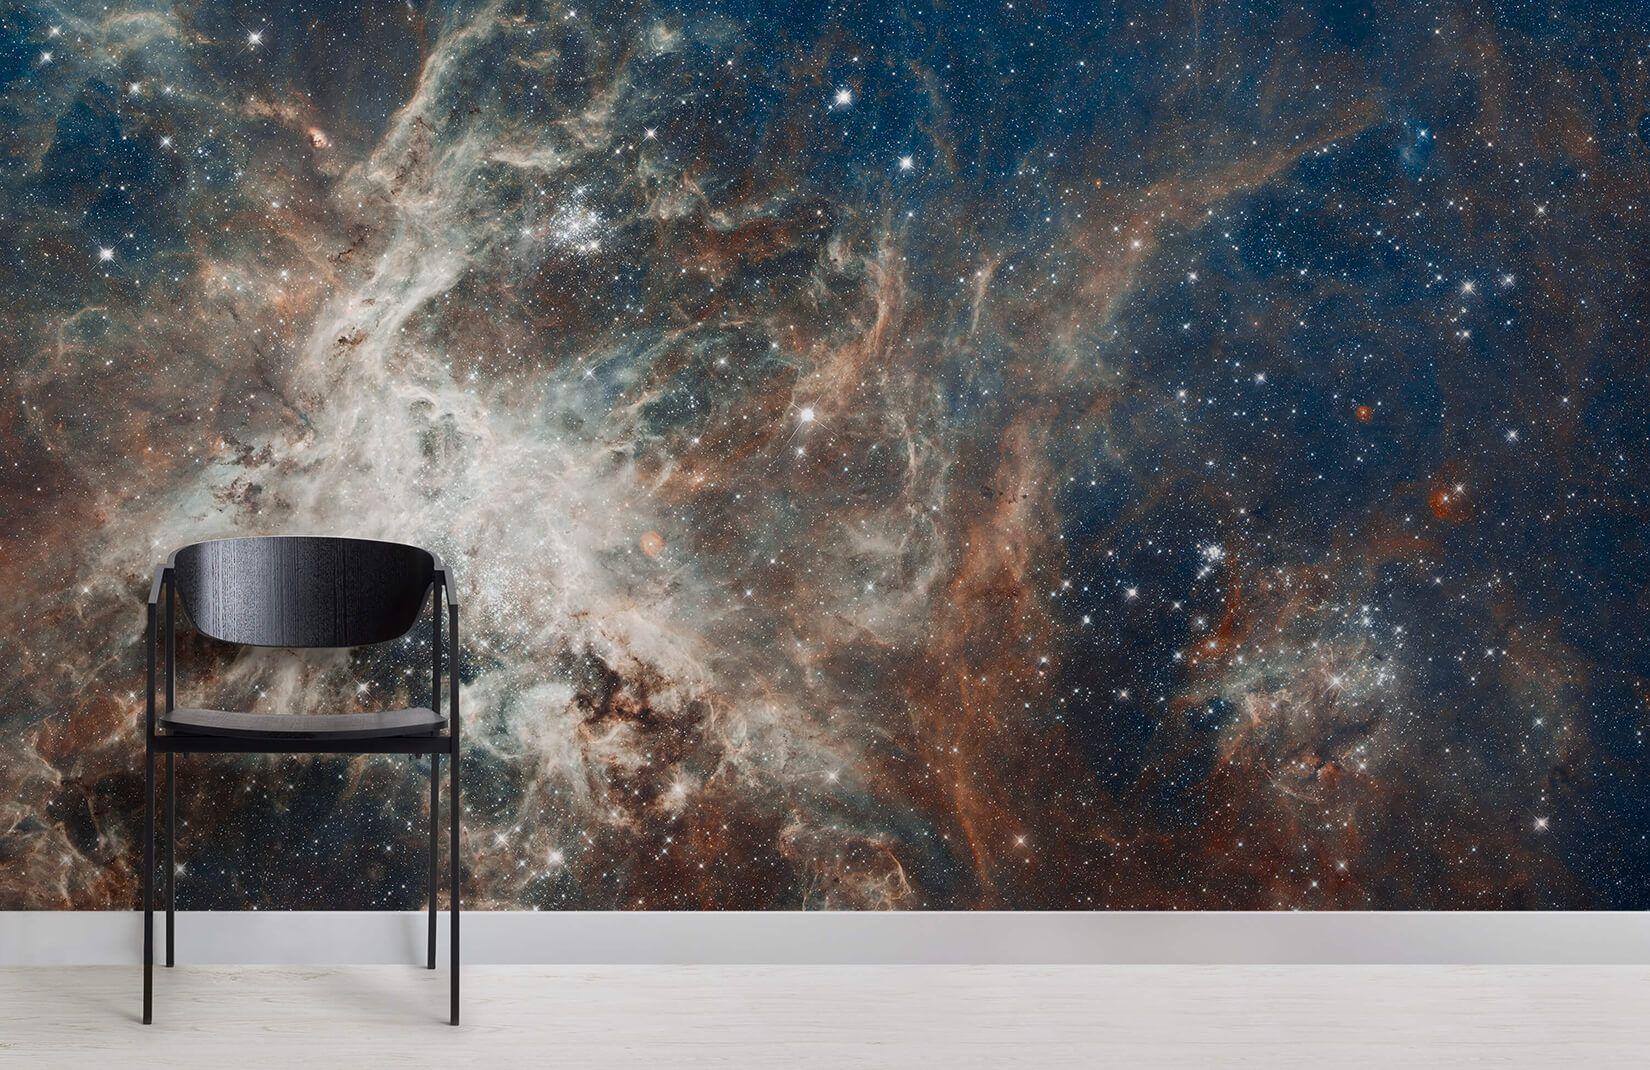 Tarantula Nebula Wallpaper Mural Murals Wallpaper In 2021 Nebula Wallpaper Outer Space Wallpaper Mural Wallpaper